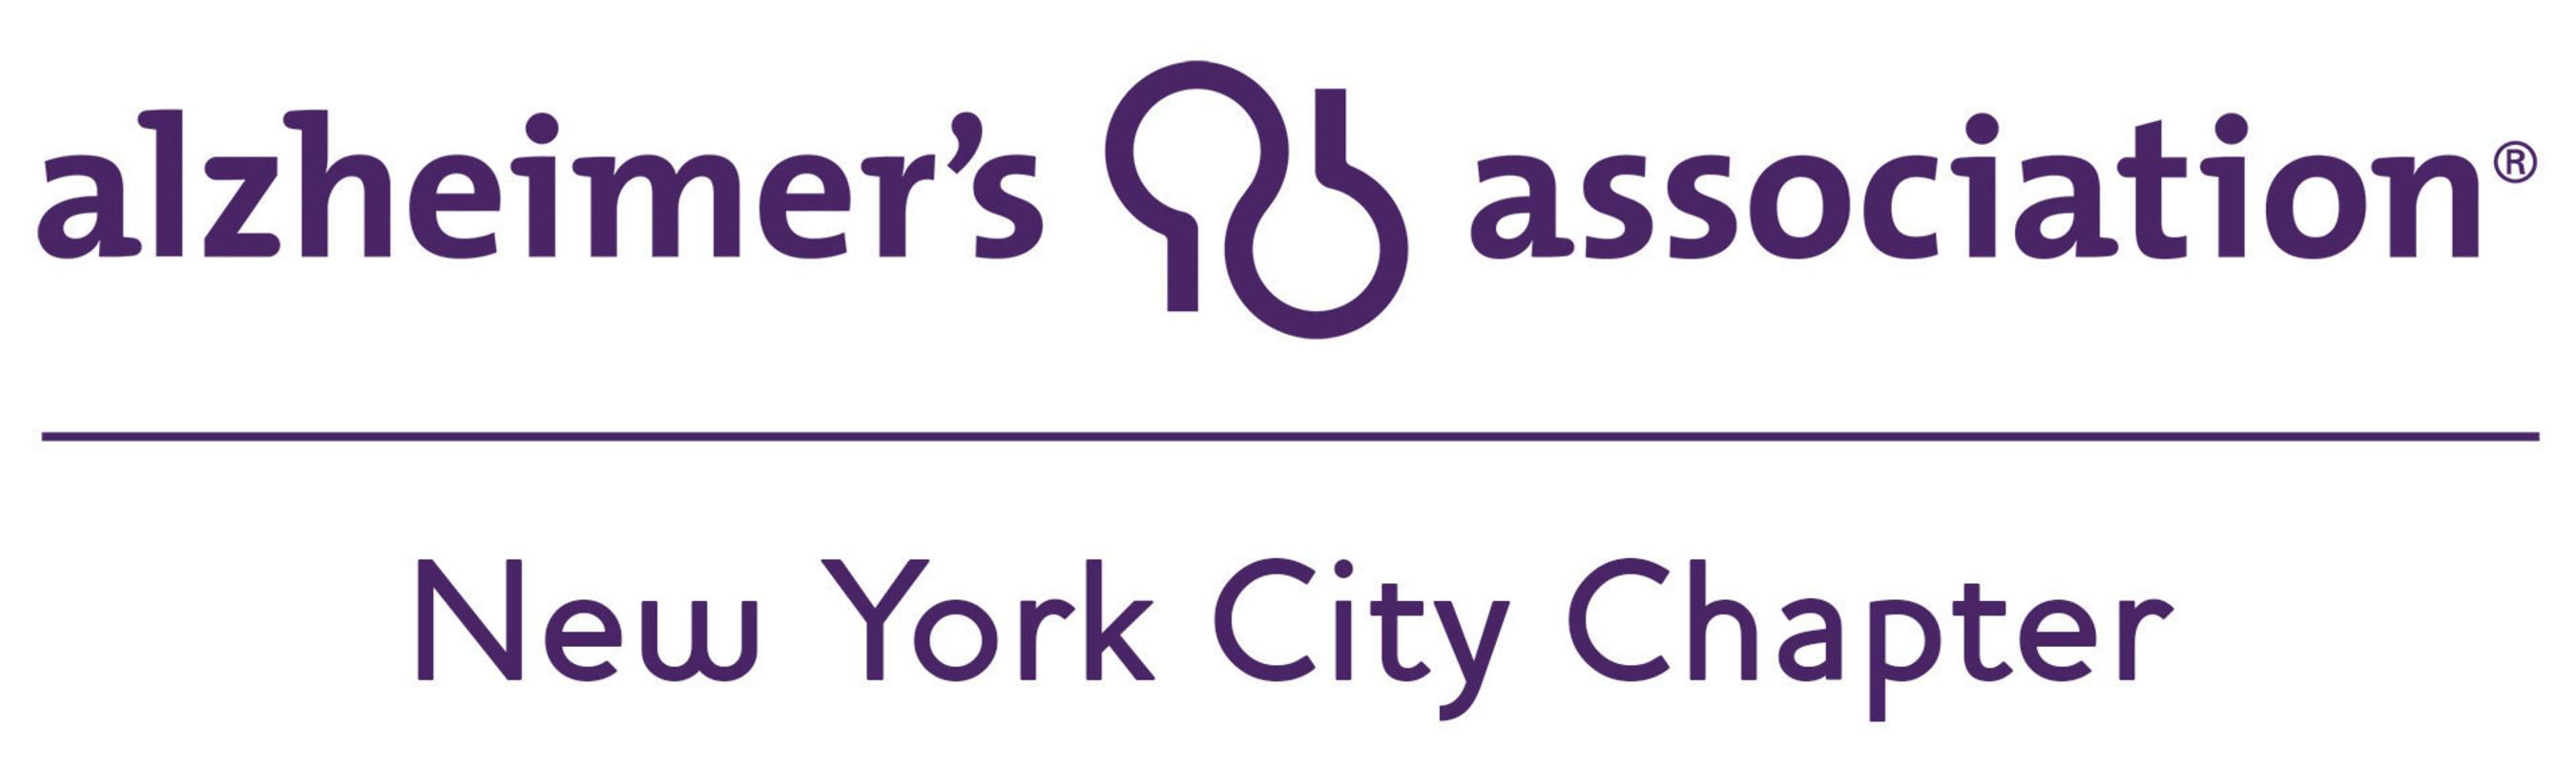 Alzheimer's Association : NYC Chapter Logo - http://www.alz.org/nyc/